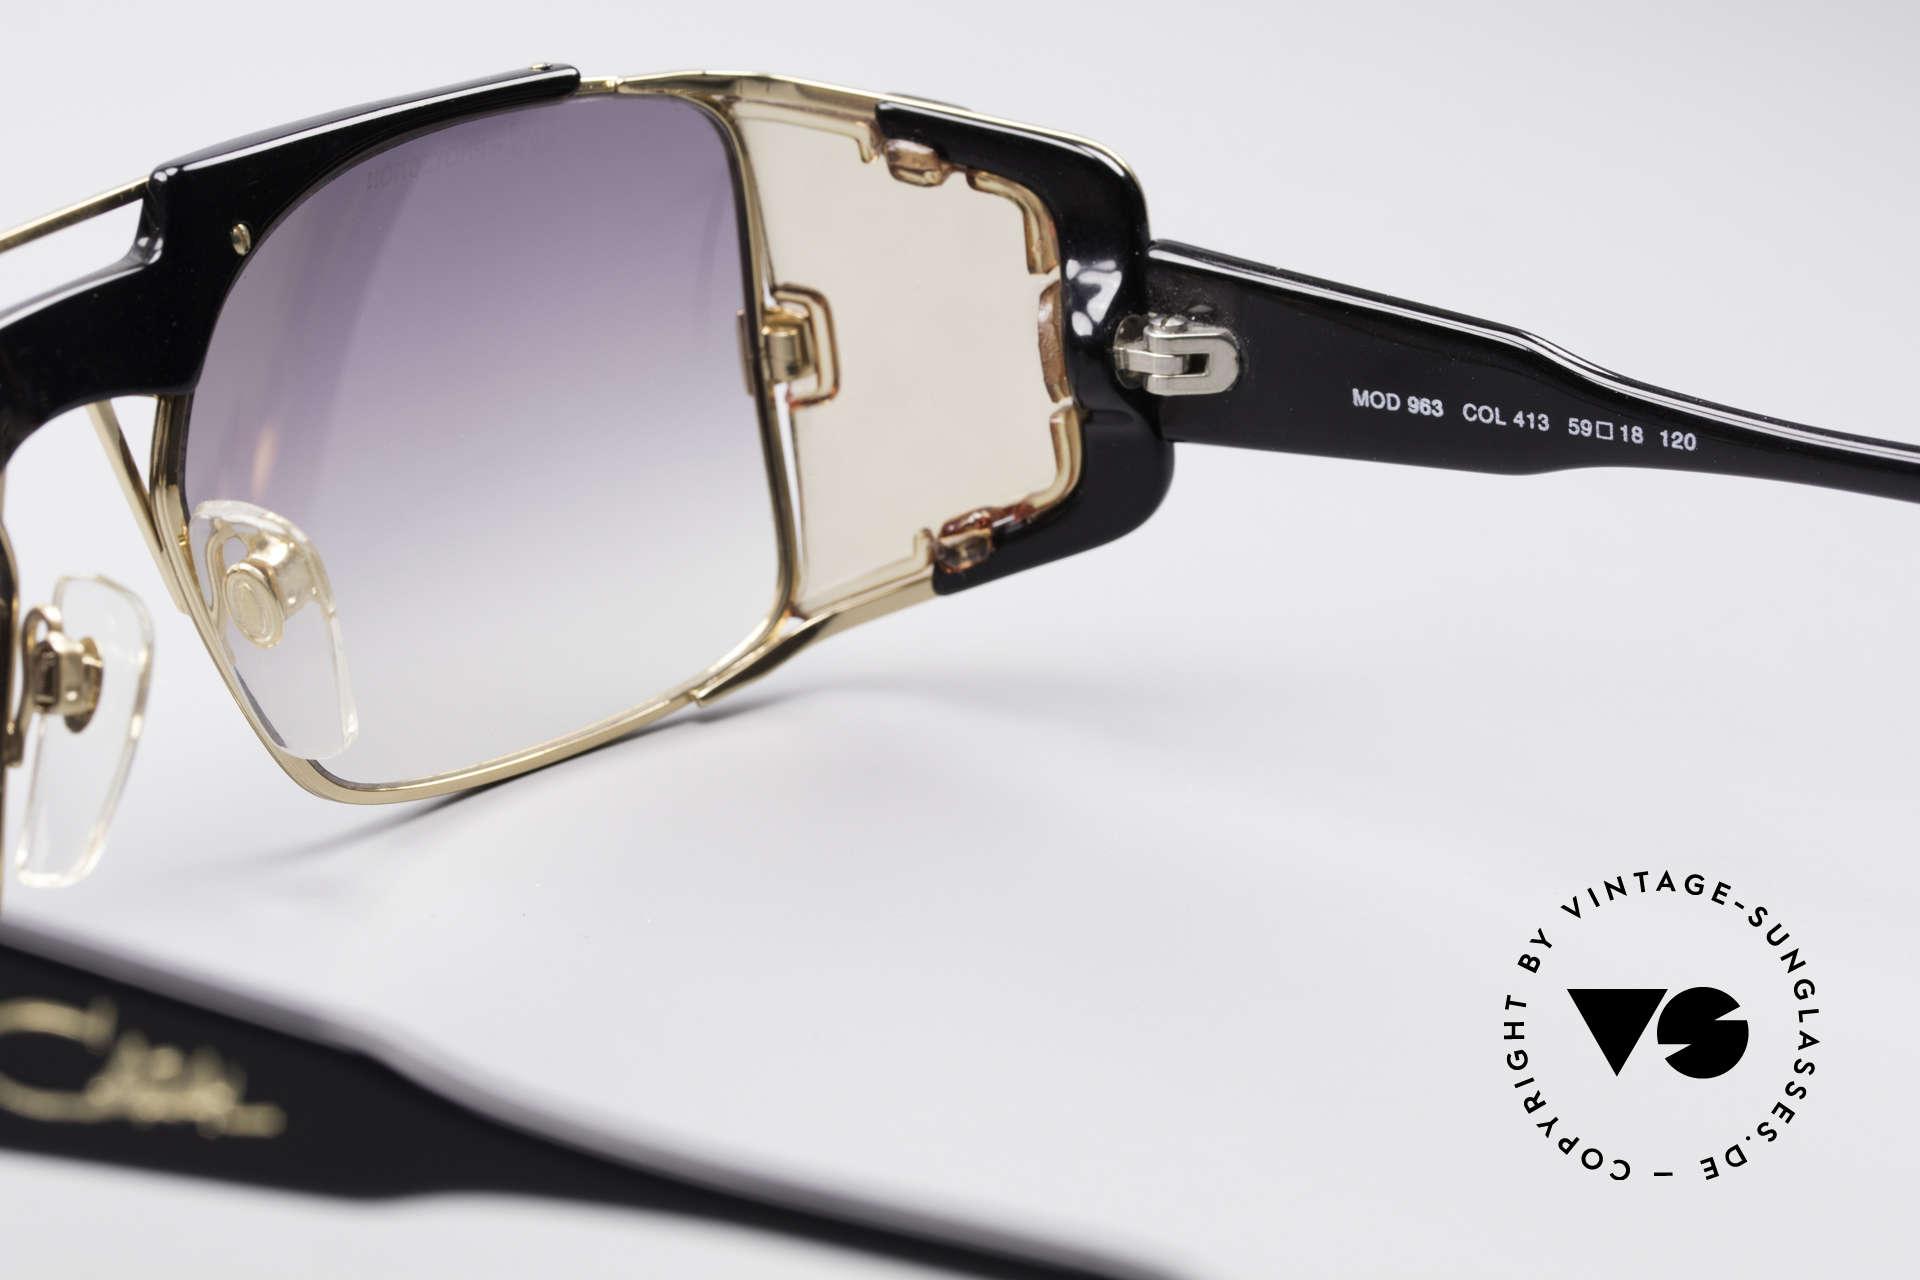 0d9ffdd1f546 Sunglasses Cazal 963 True Vintage Old School Shades